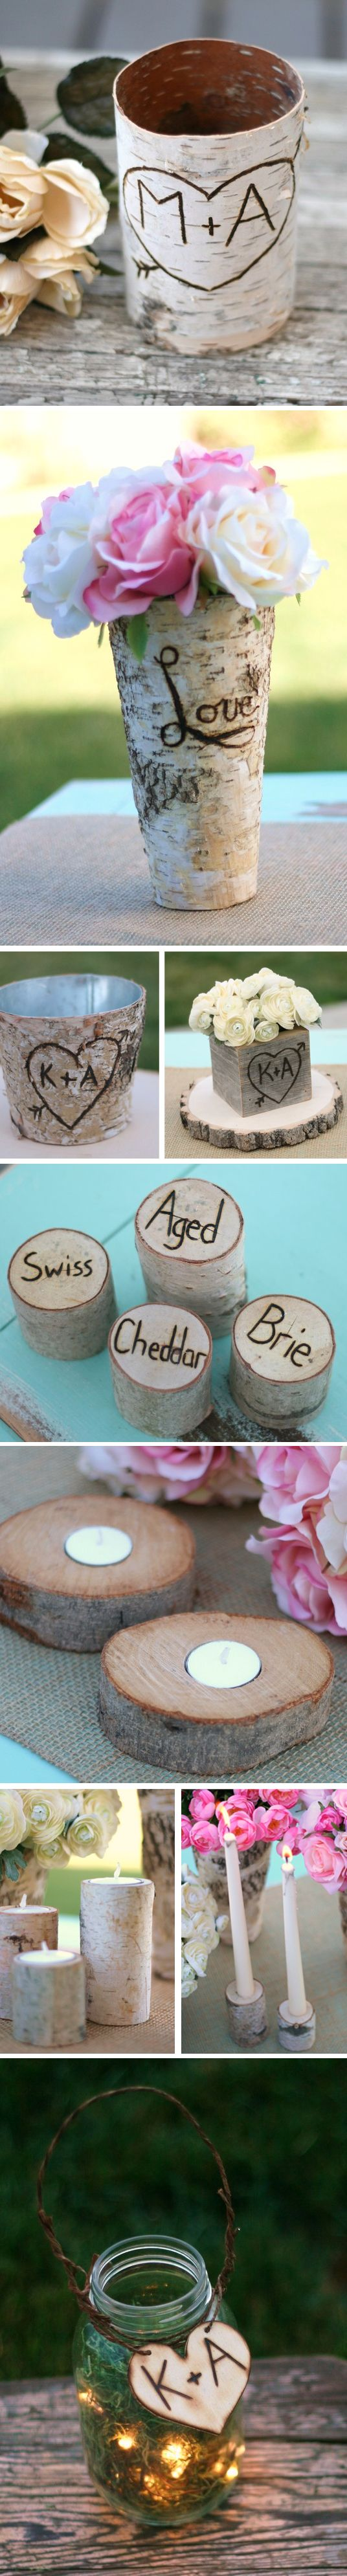 96 best A & B wedding ideas images on Pinterest